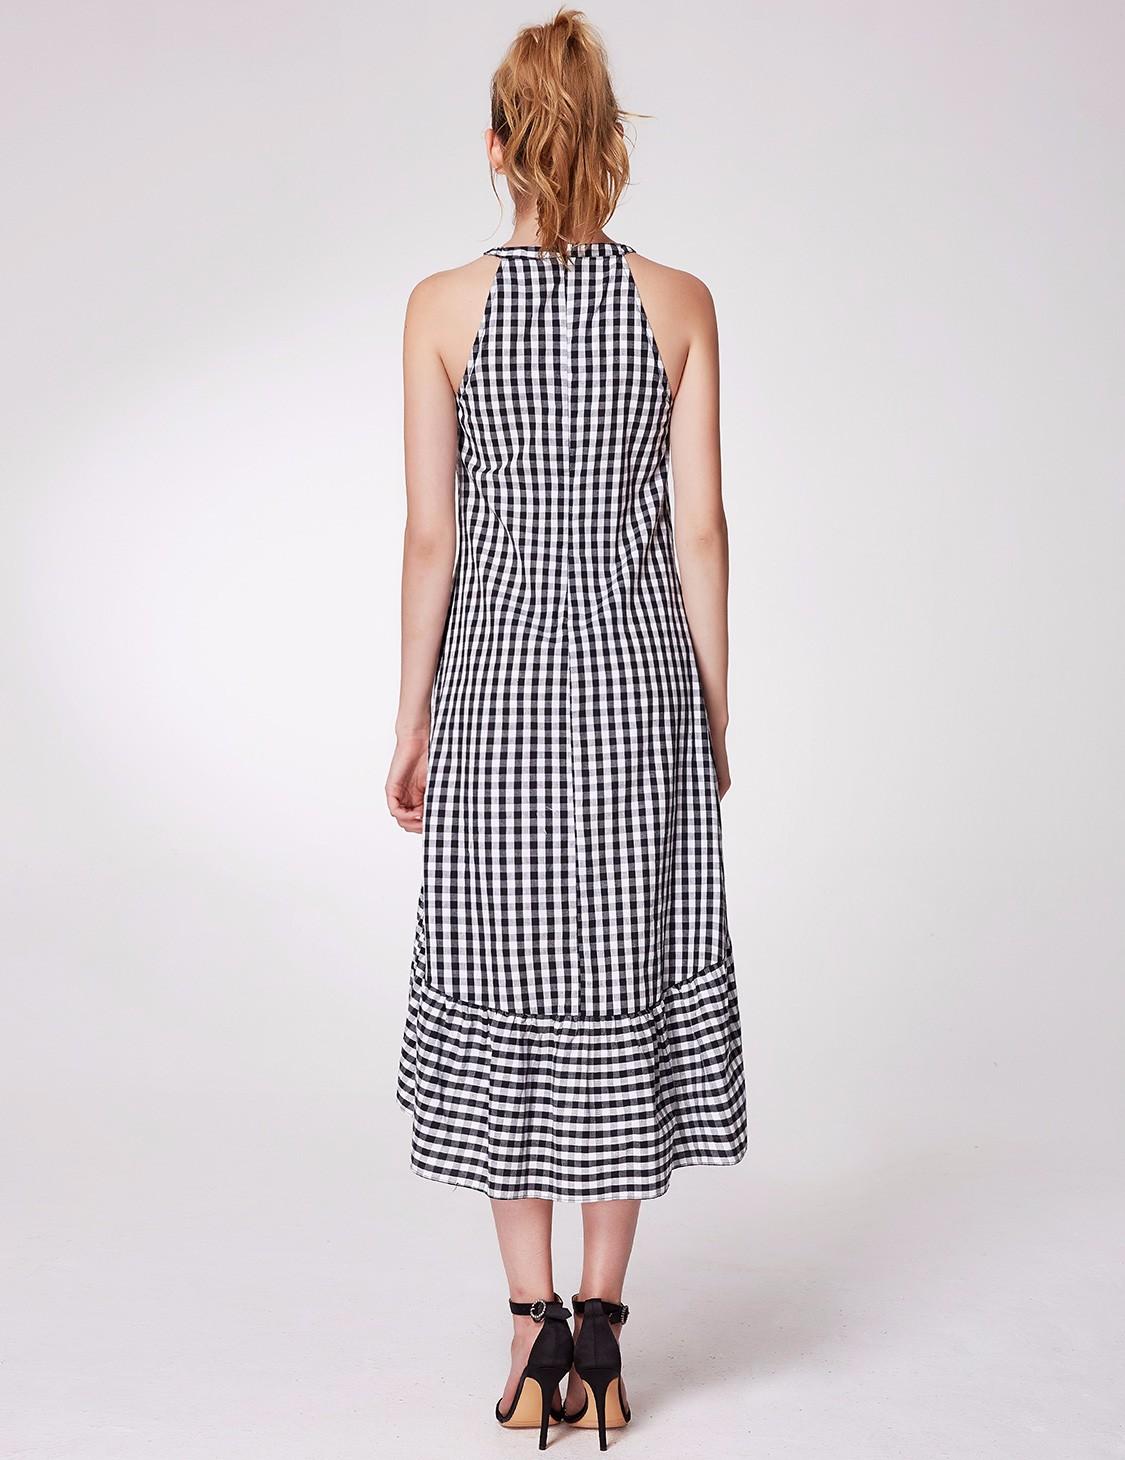 Alisa-Pan-New-Fashion-Halter-Sleeveless-High-low-Layered-Slim-Plaid-Dress-05989